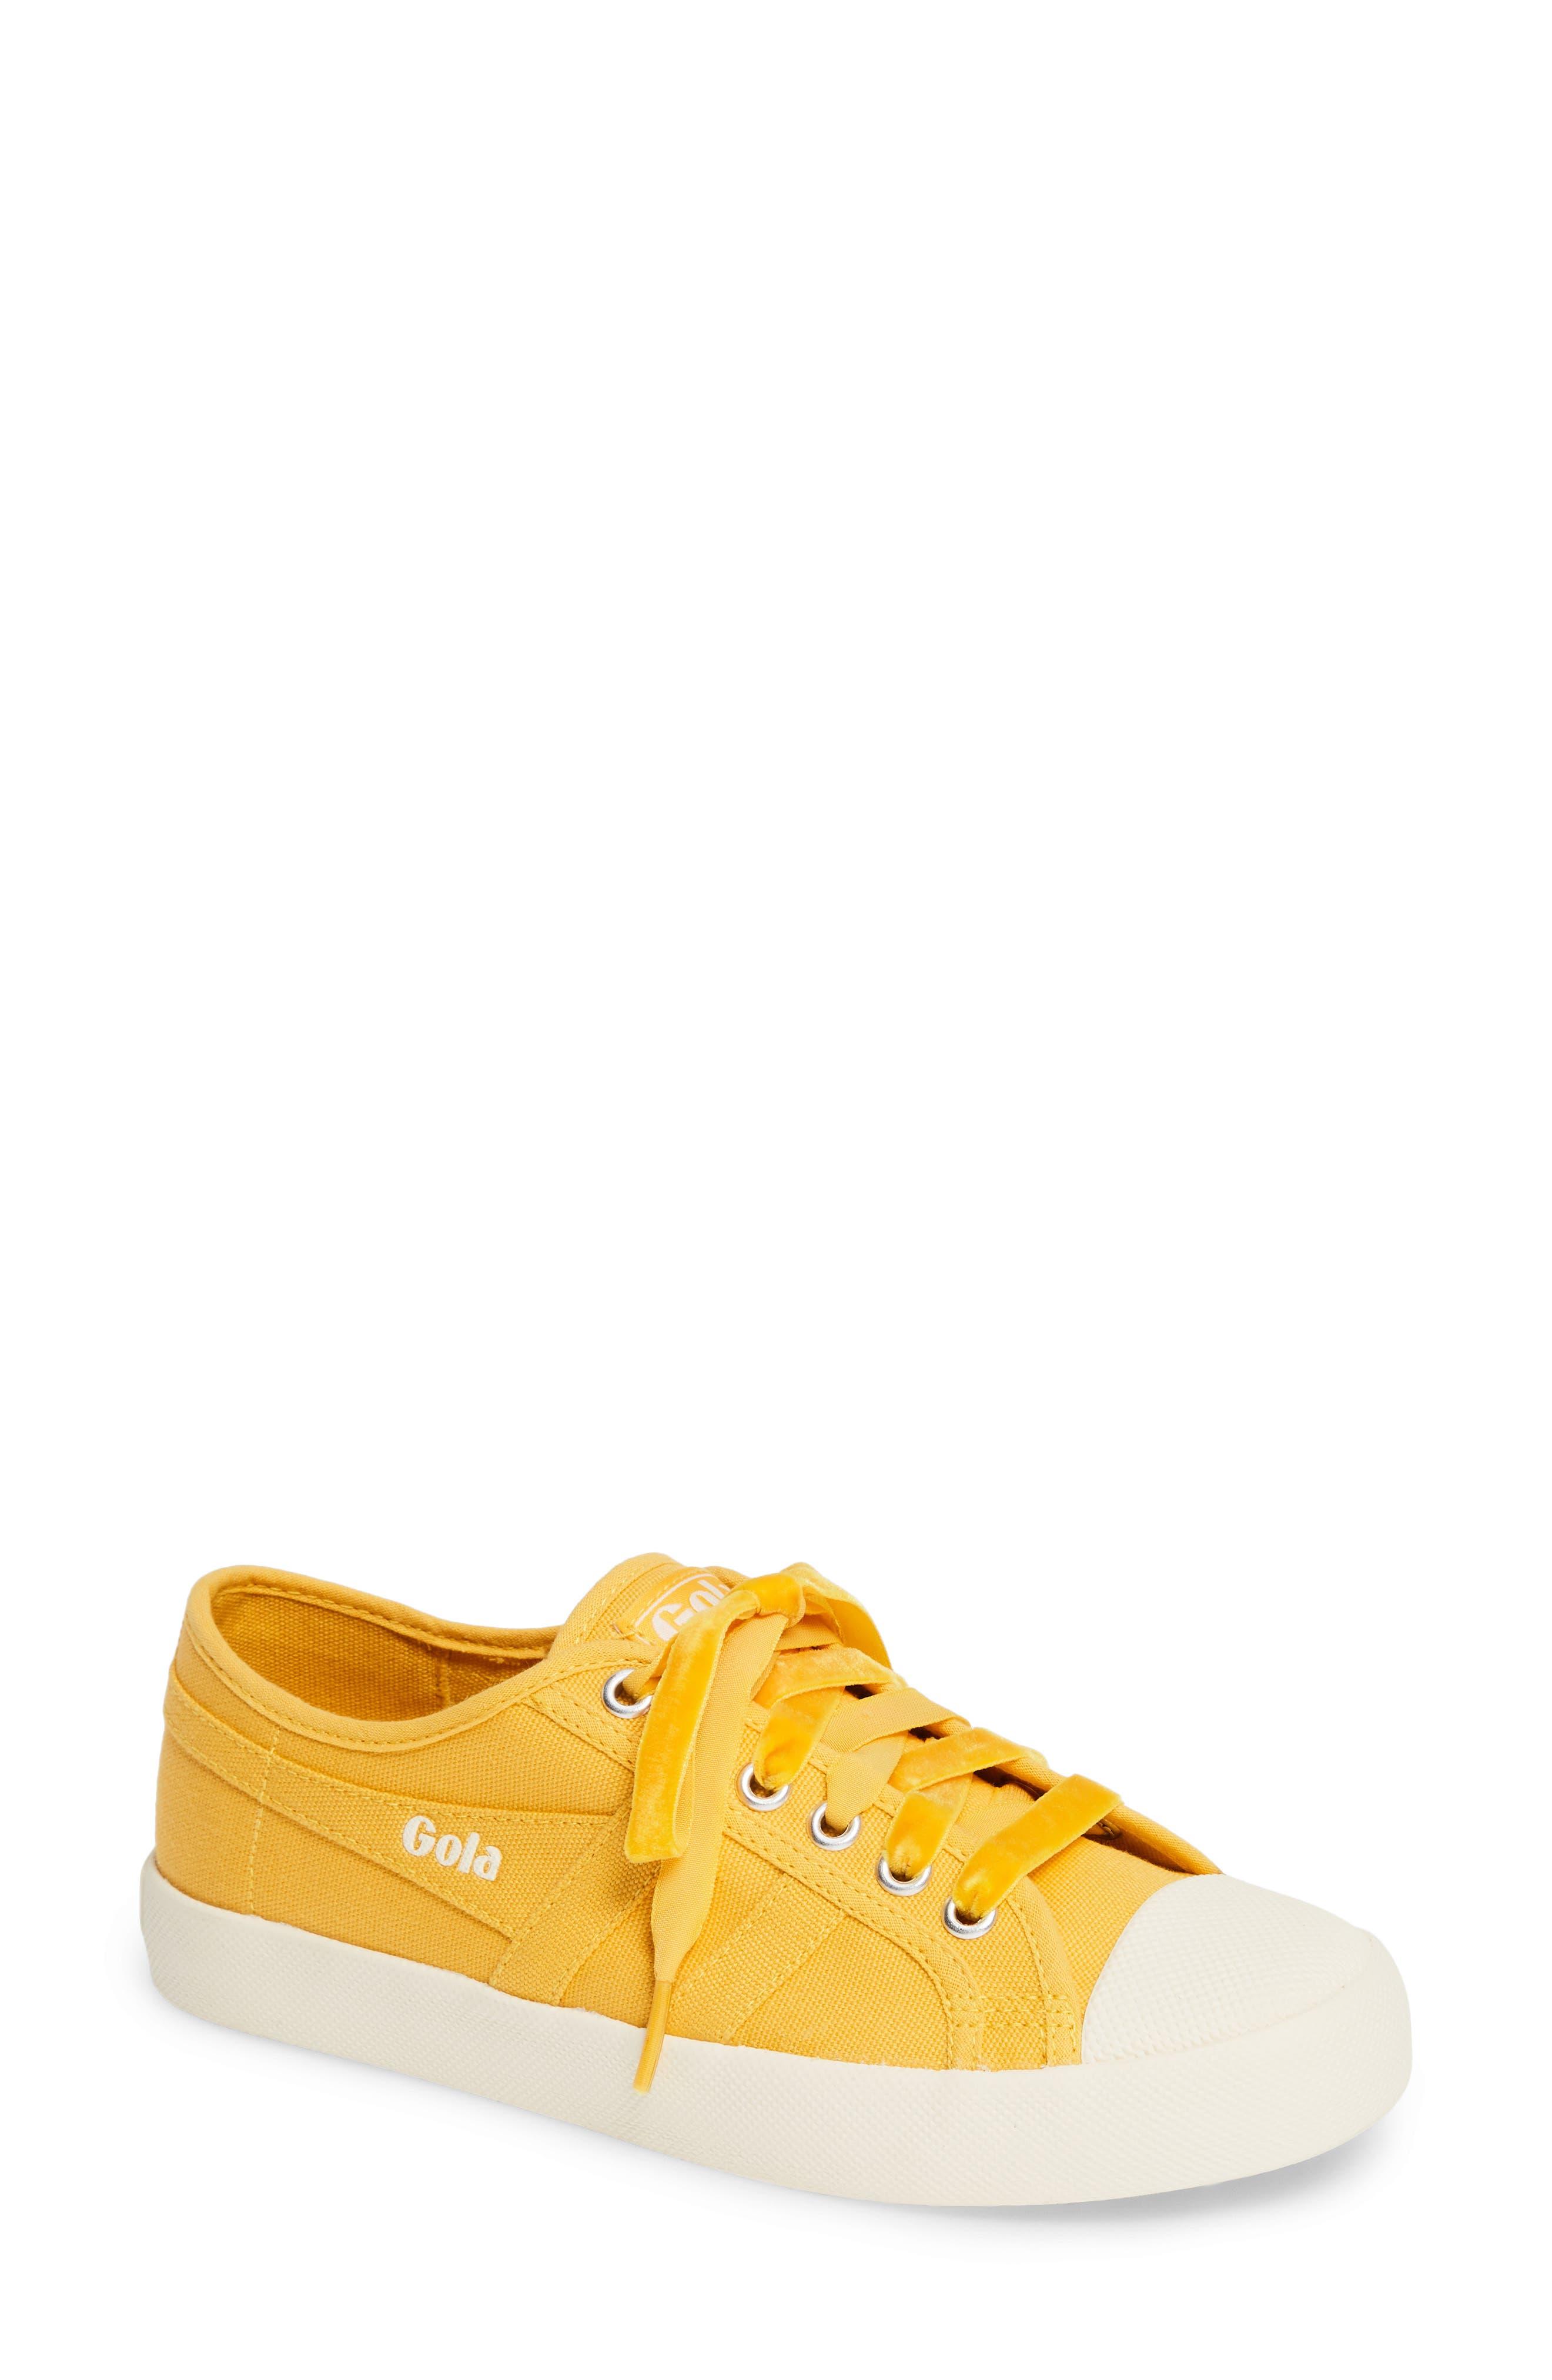 Coaster Sneaker,                             Main thumbnail 1, color,                             SUN/ OFF WHITE